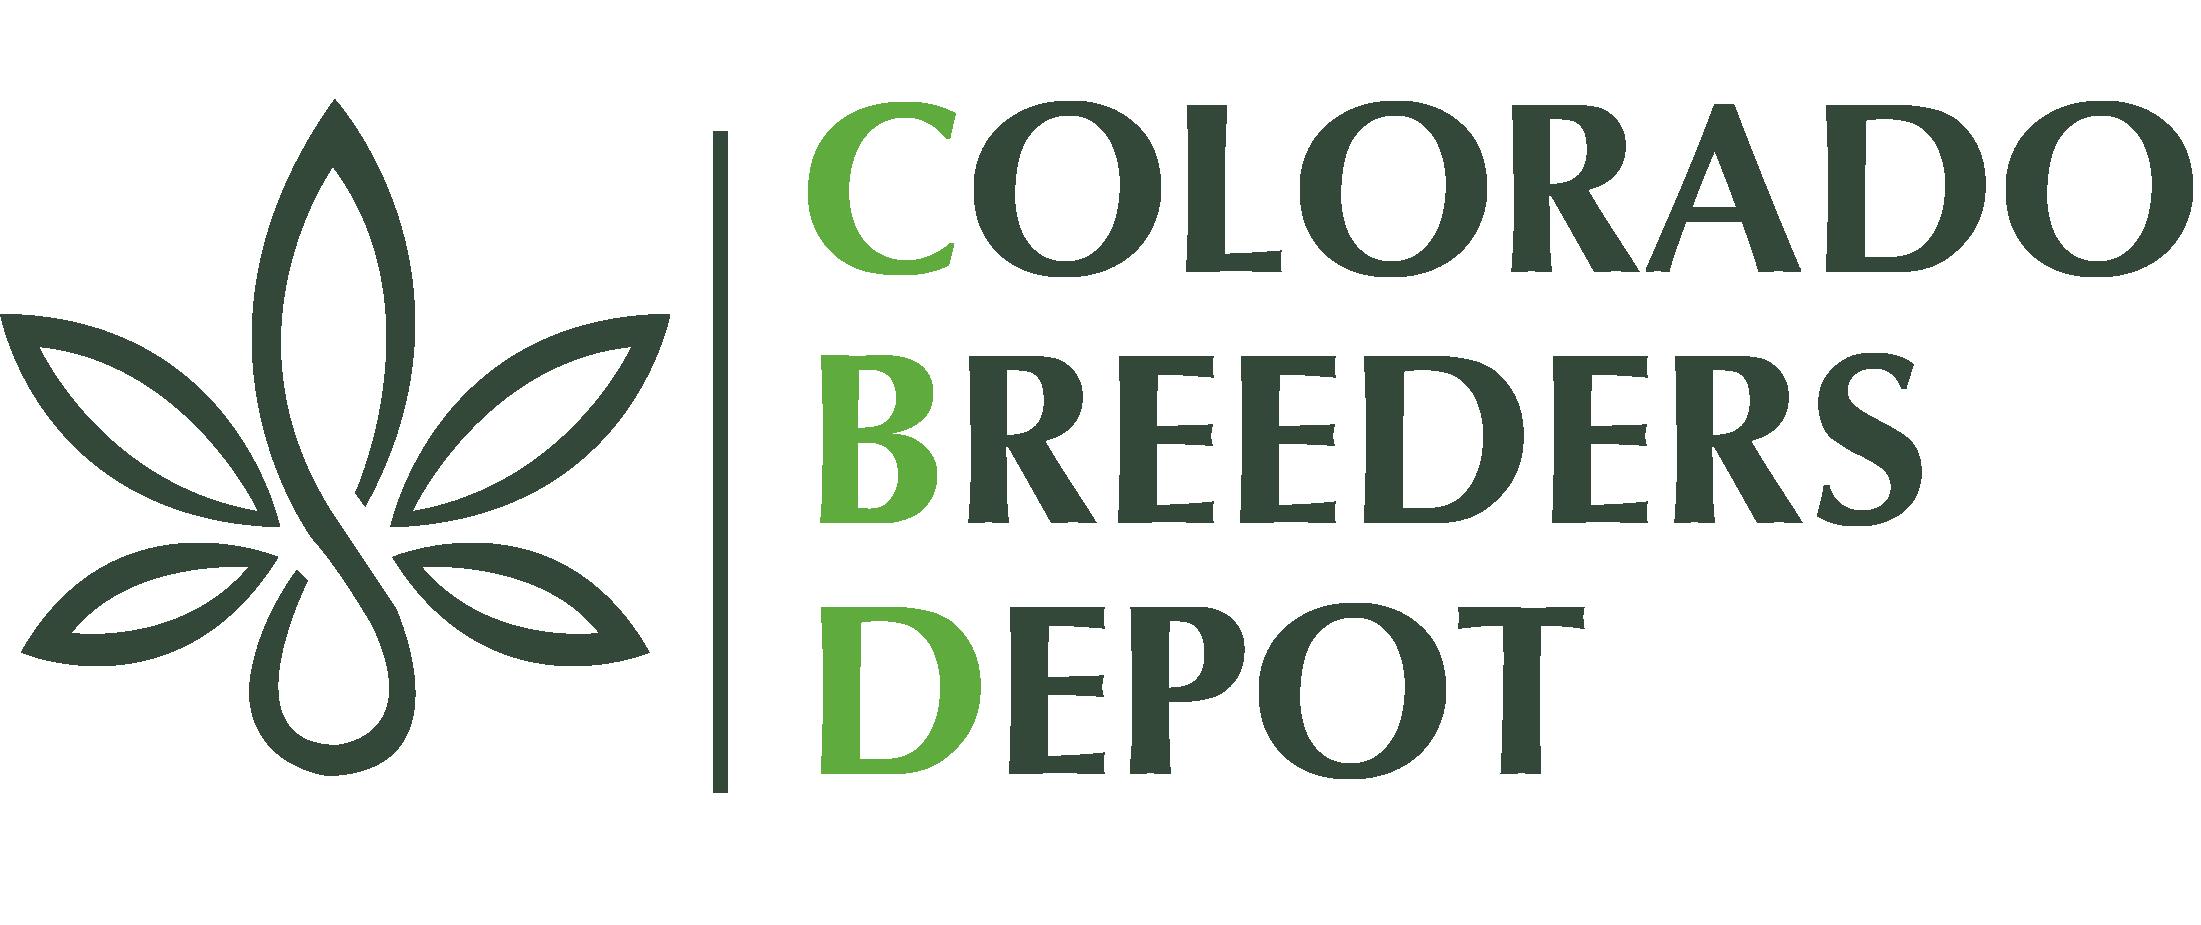 CBD Strains | Colorado Breeders Depot